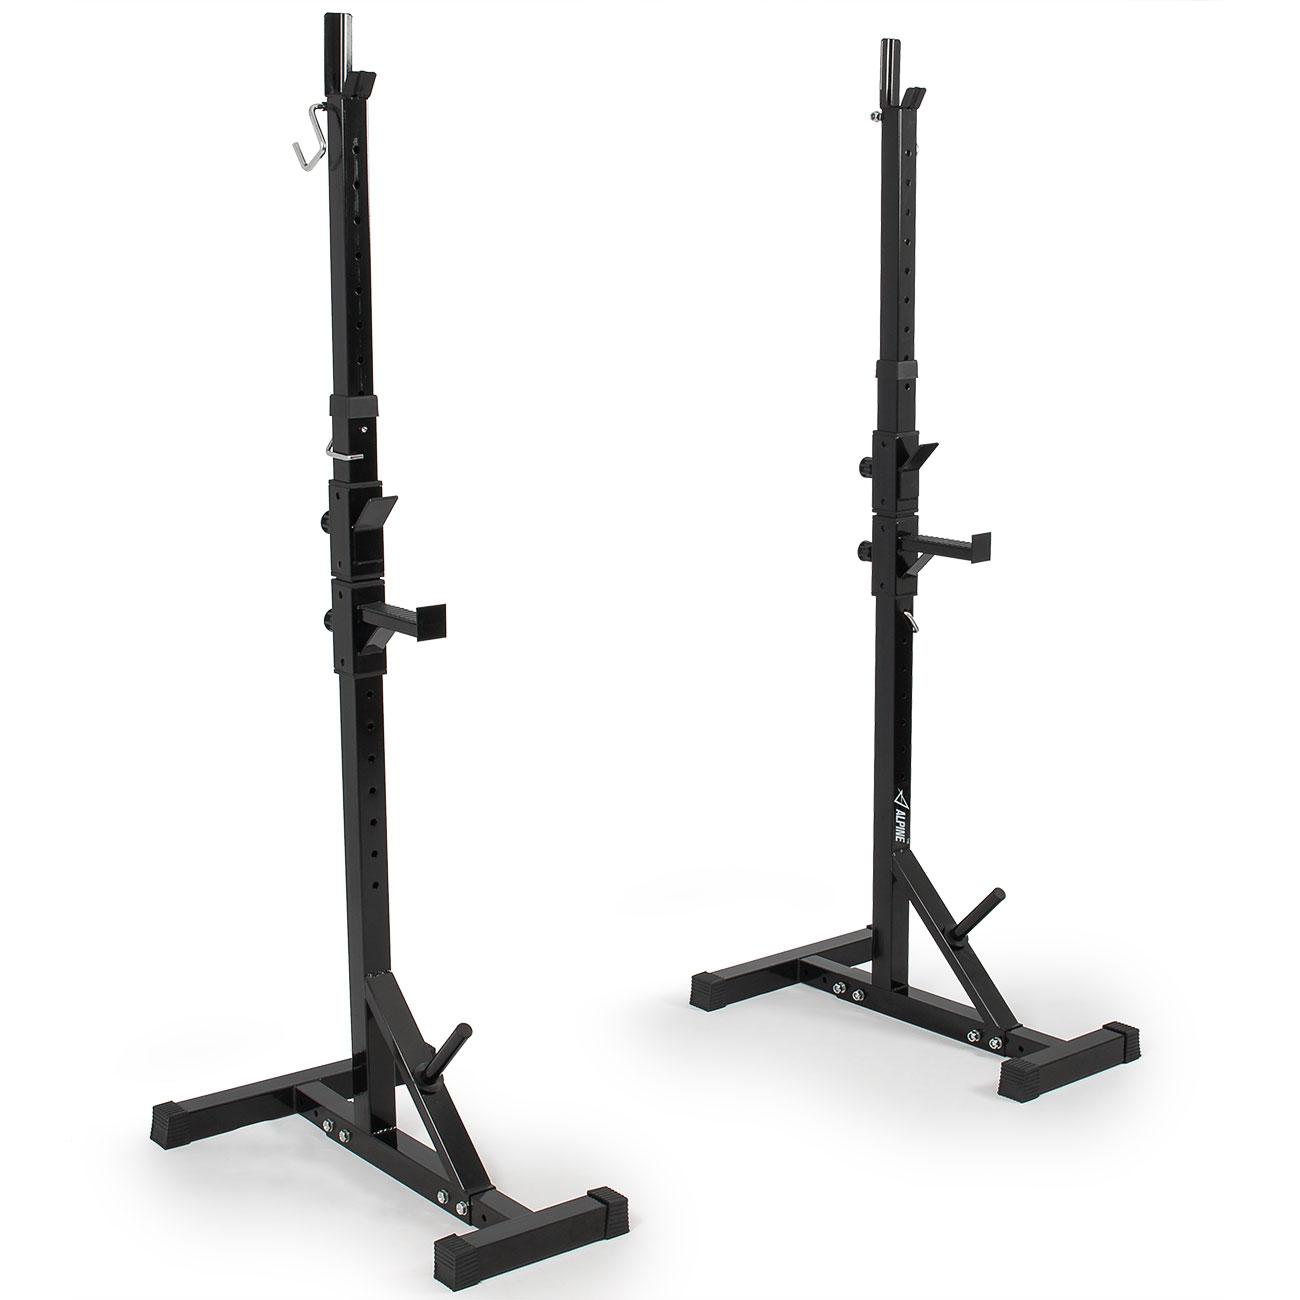 2x Adjustable Rack Stand Standard Steel Squat Barbell Squat Bench Press Workout Ebay